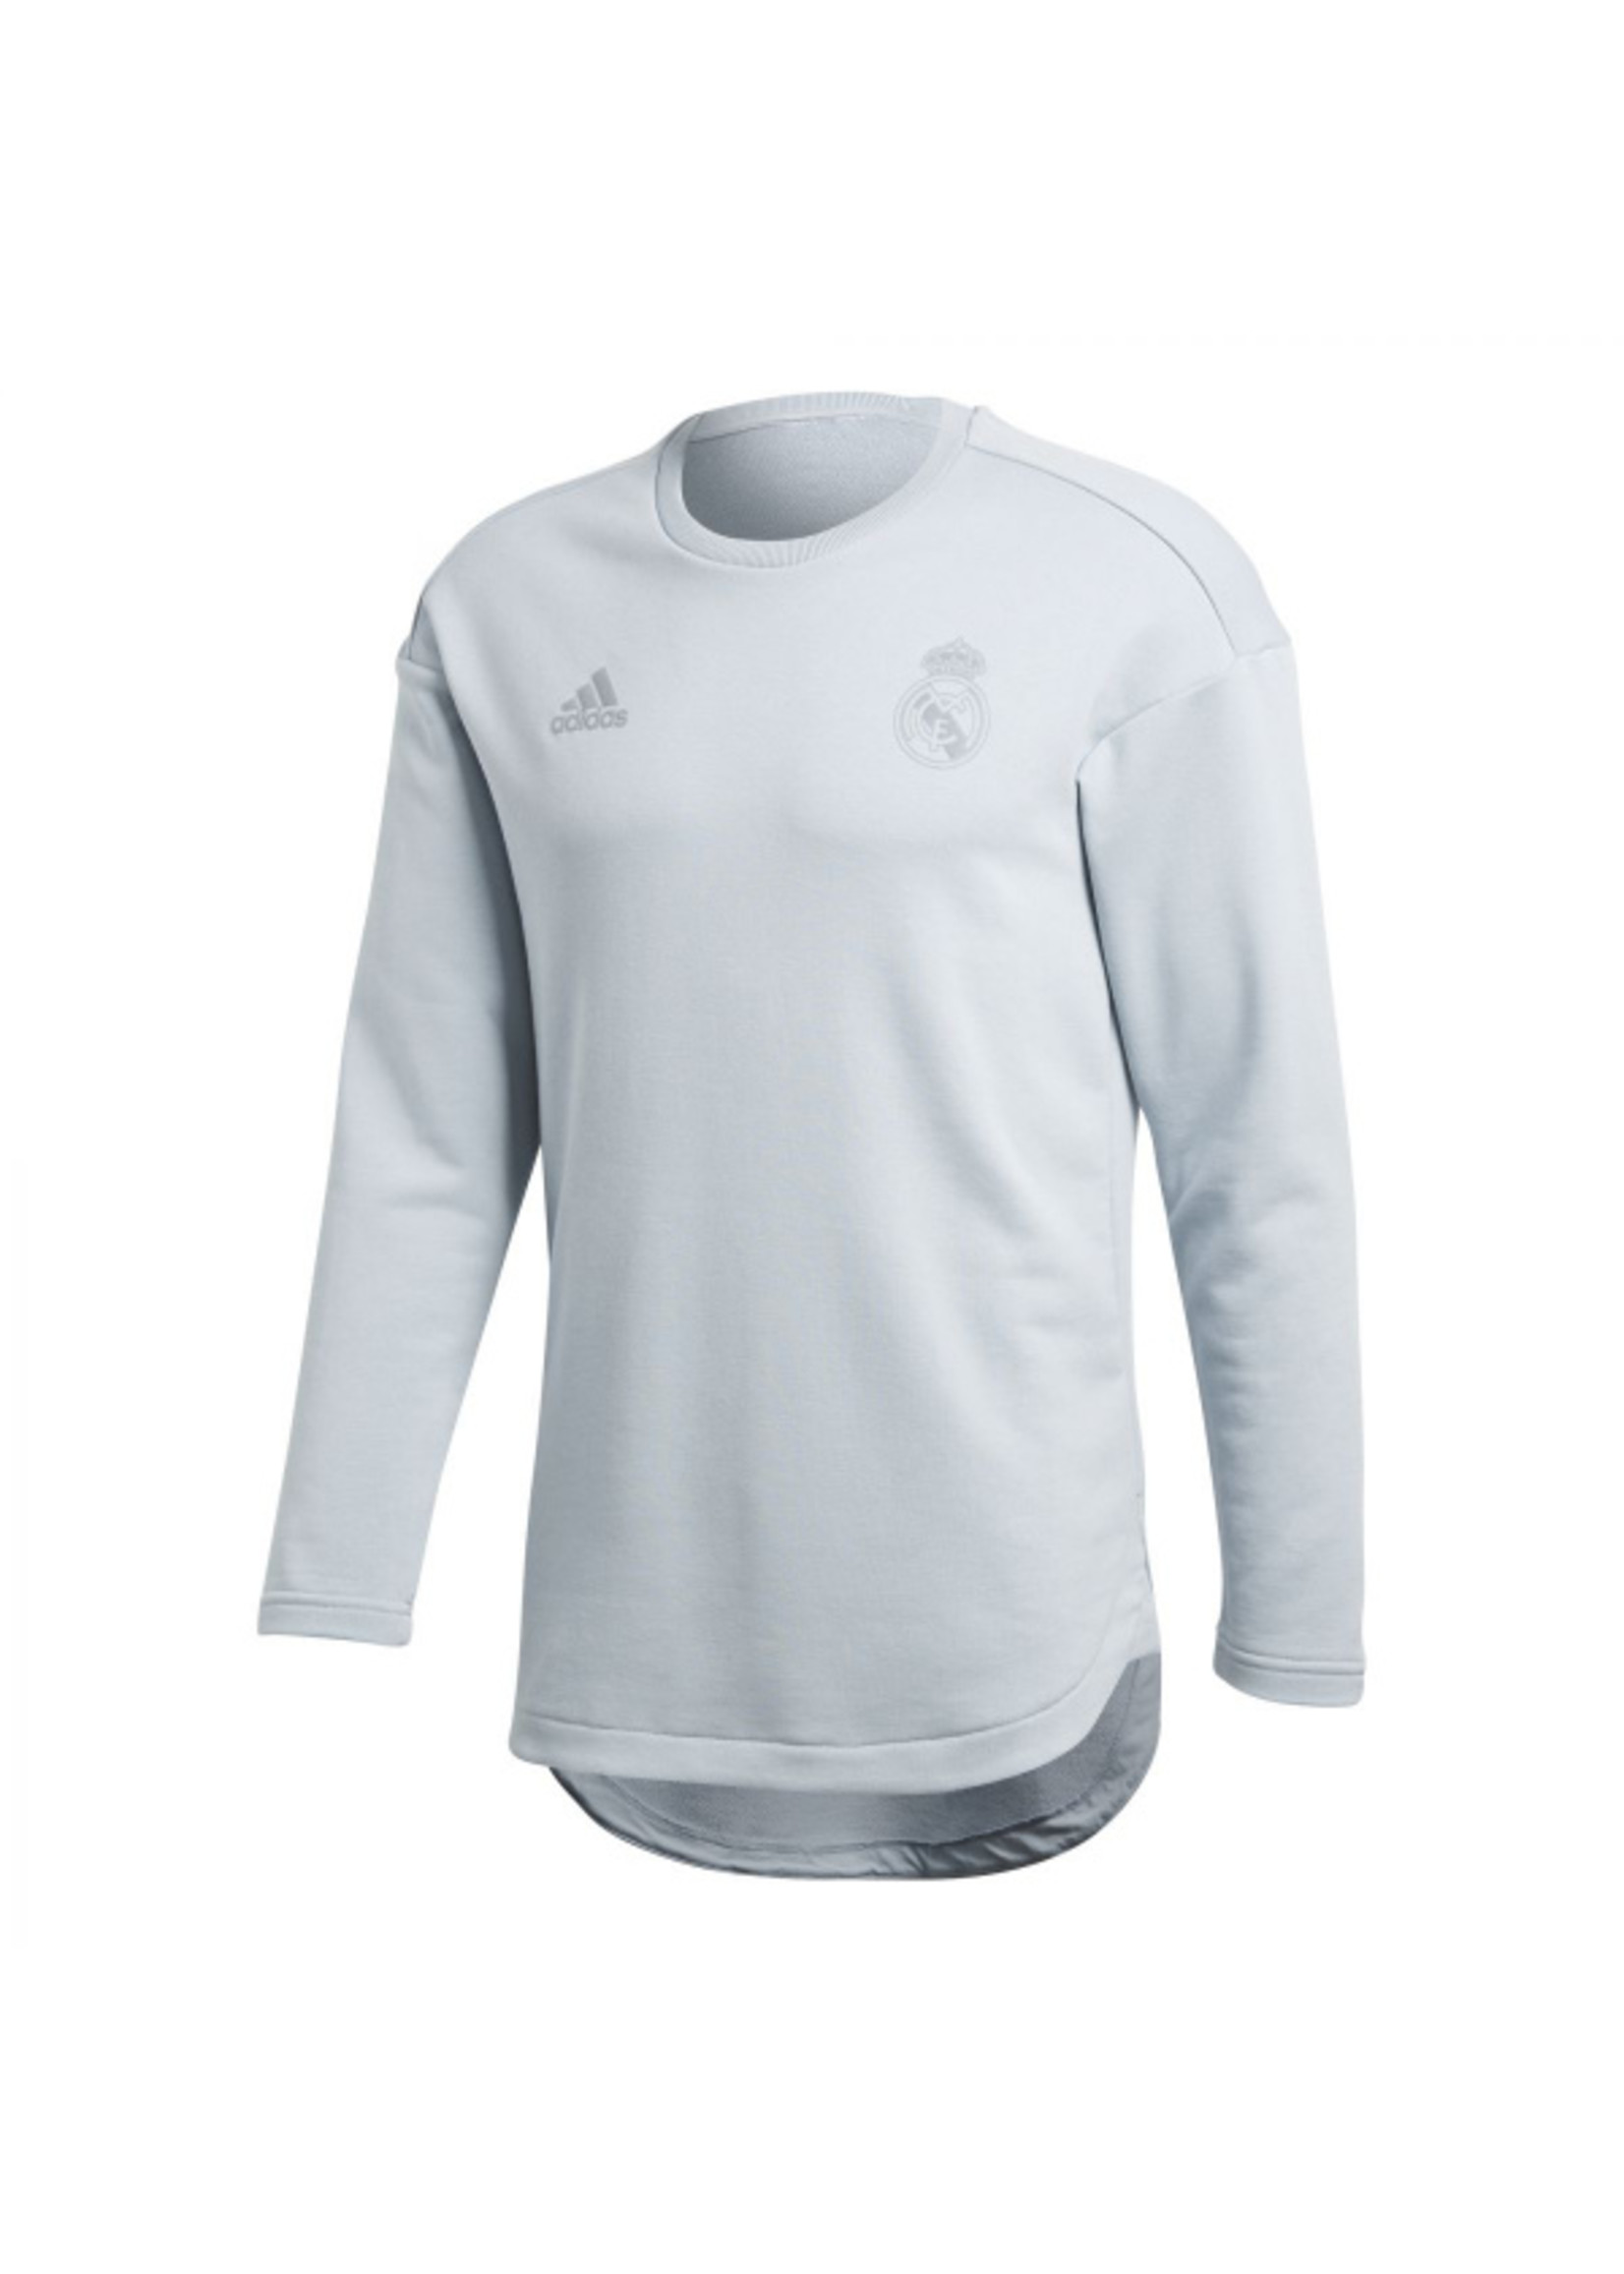 Adidas REAL SSP SWSHI